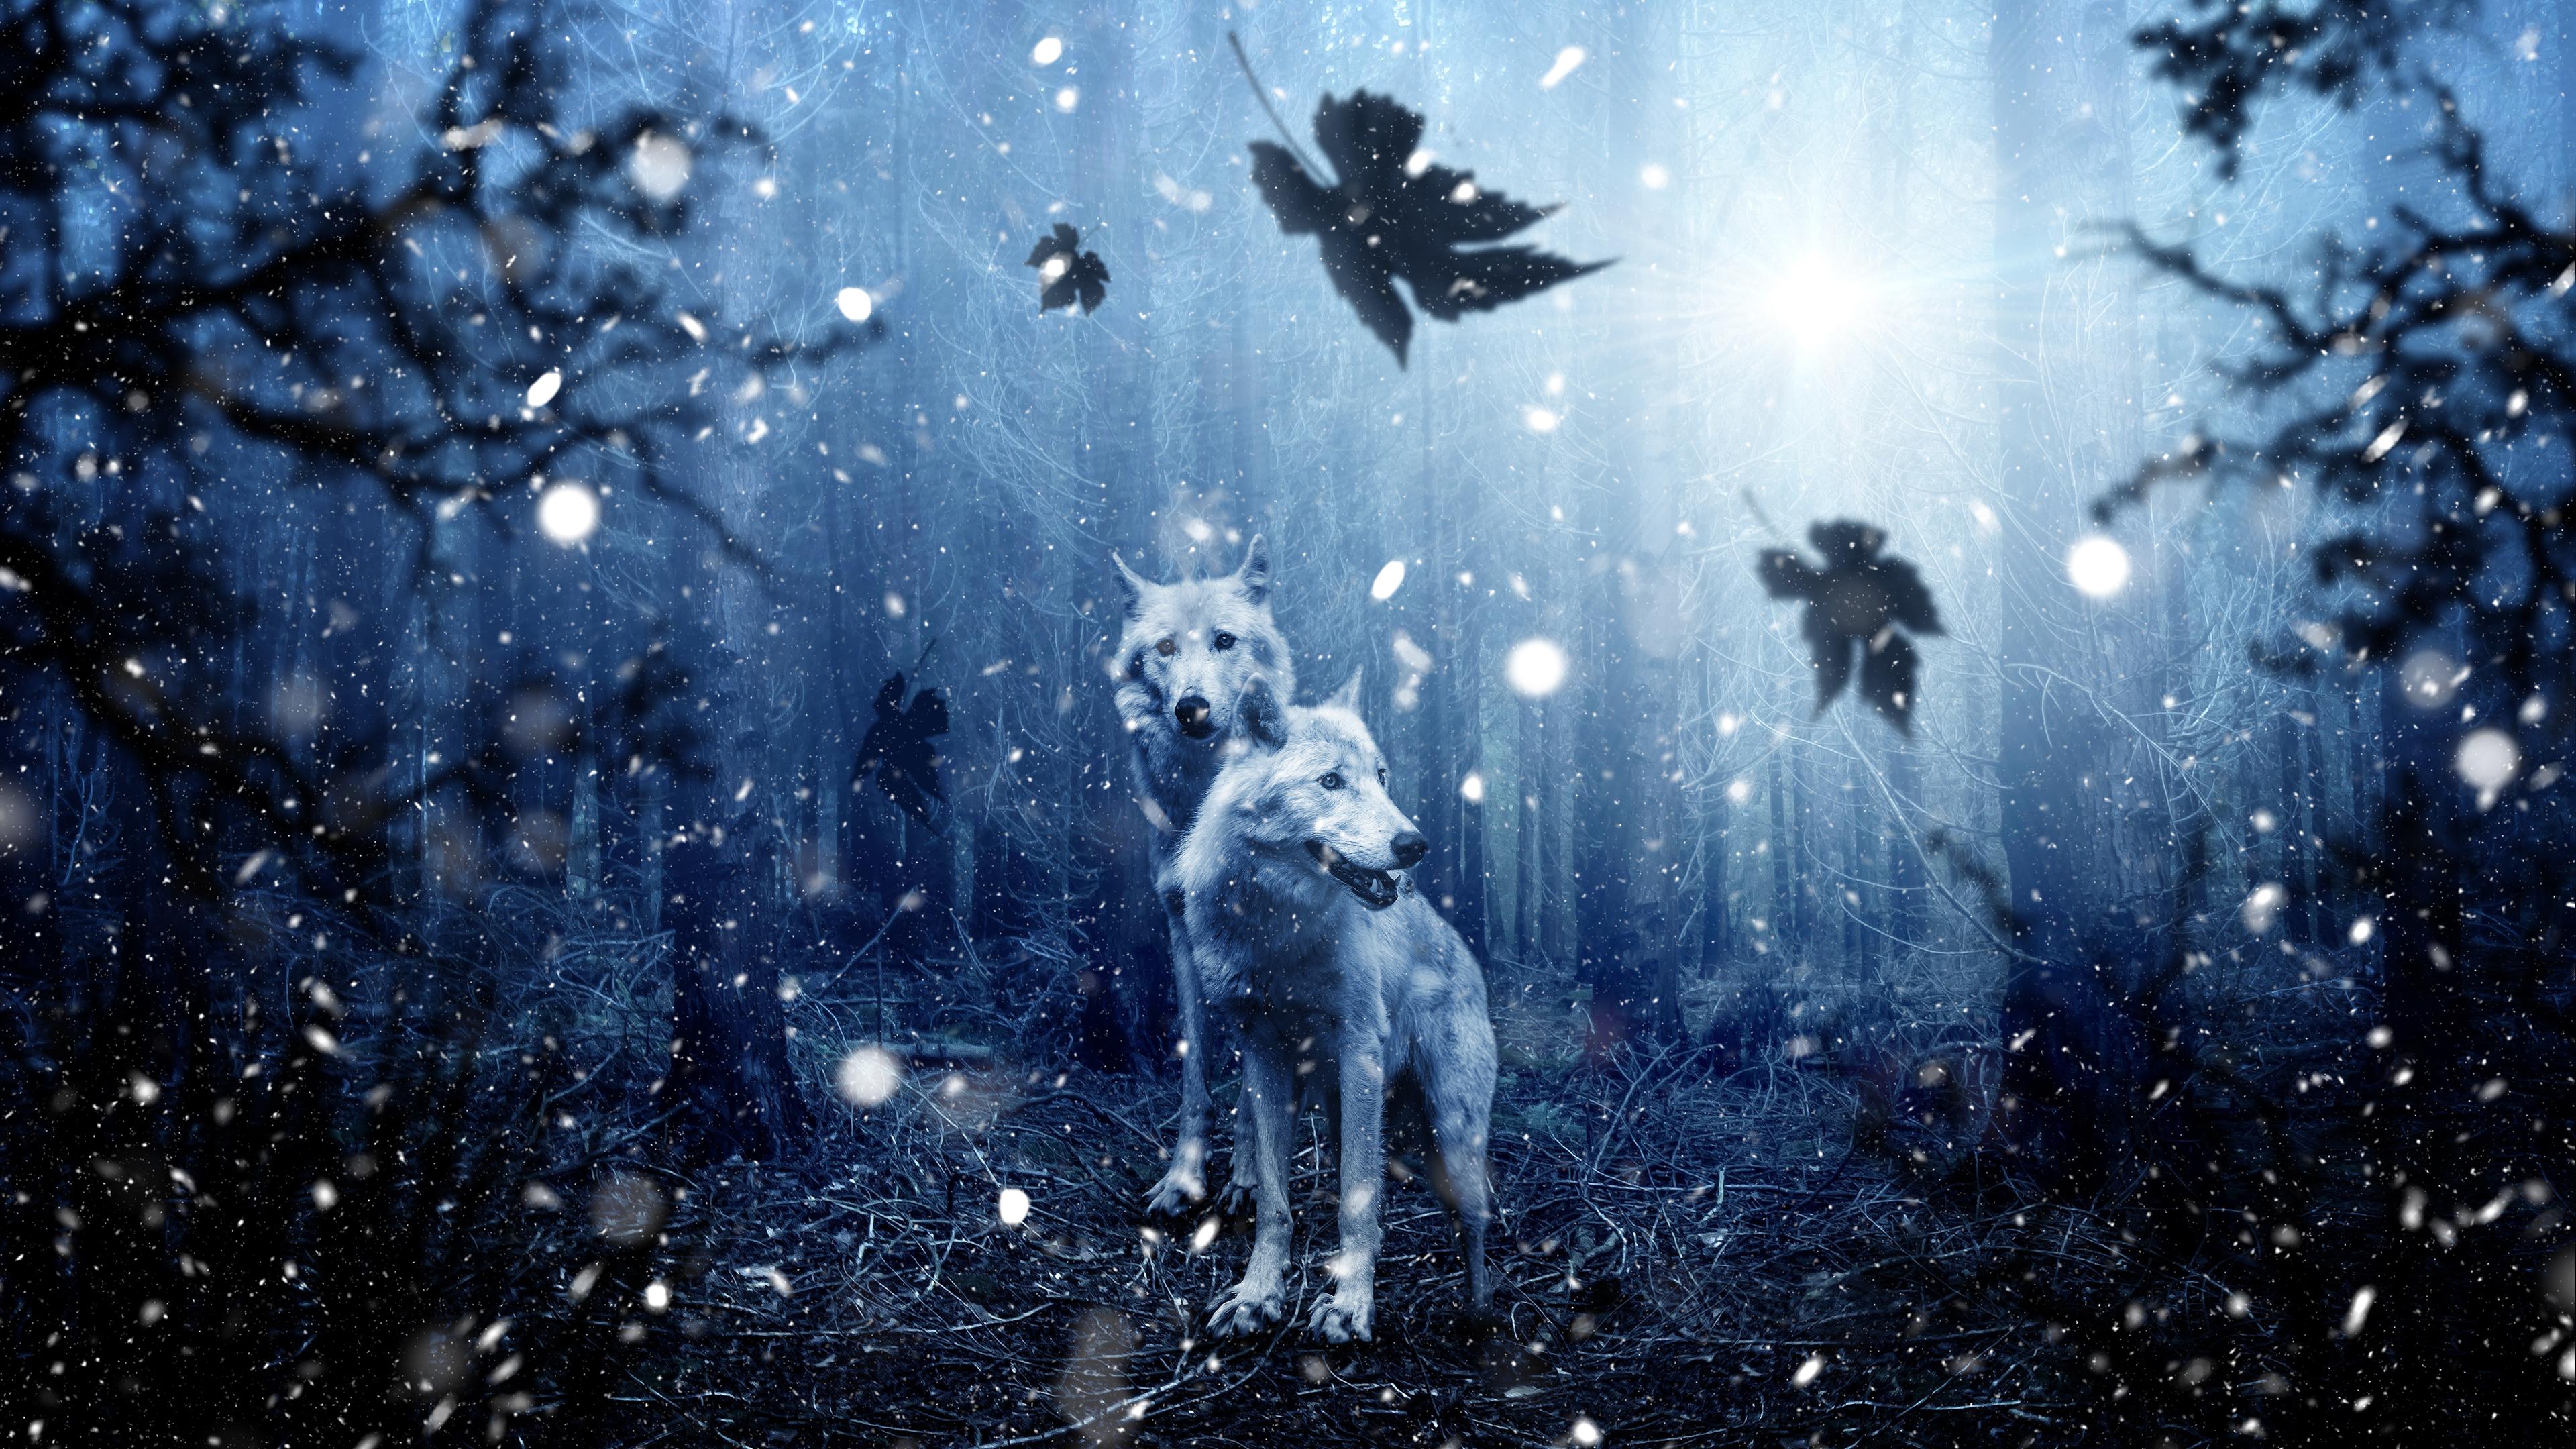 4K Winter Wolves Wallpaper HD